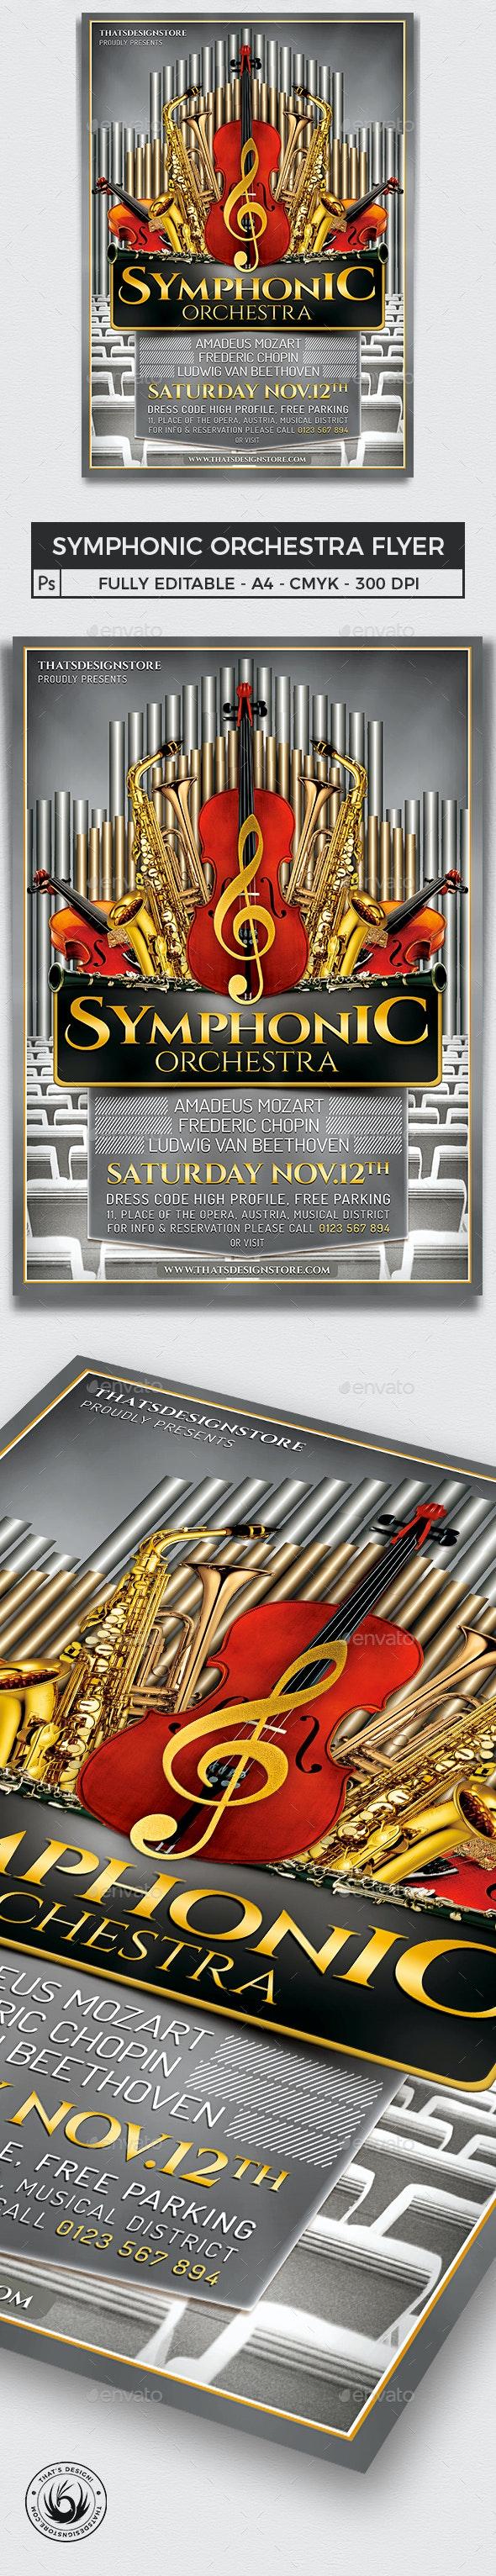 Symphonic Orchestra Flyer Template V1 - Concerts Events